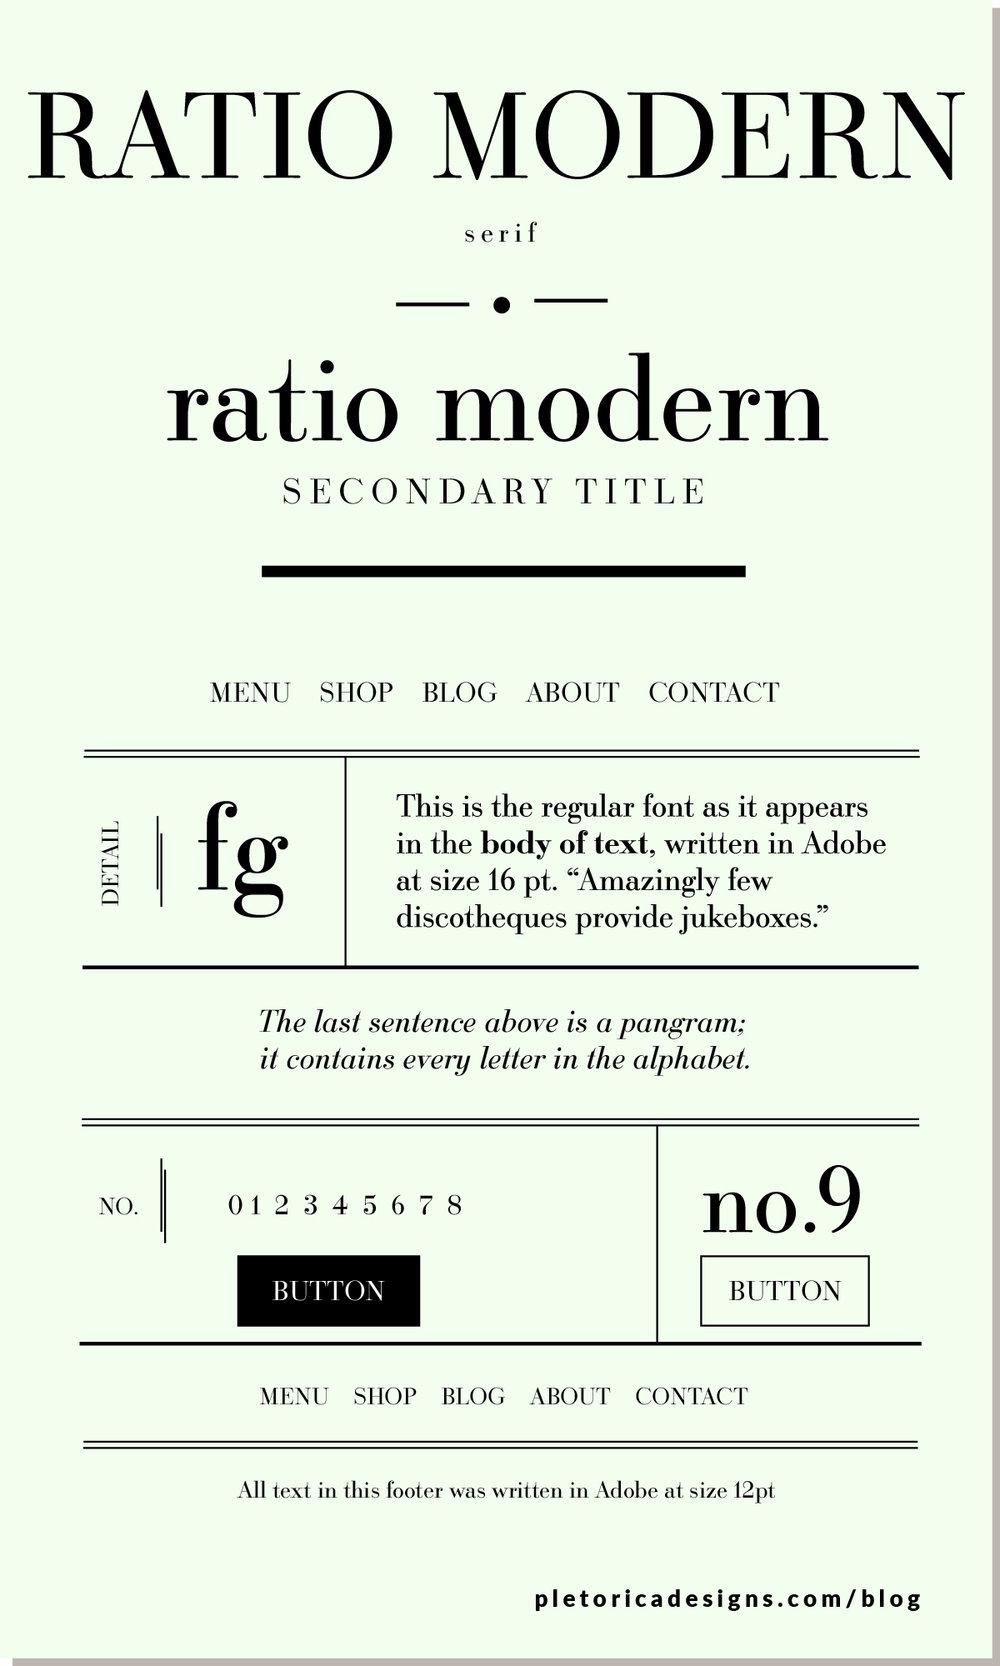 LET'S TYPE: Ratio Modern — PLETÓRICA DESIGNS